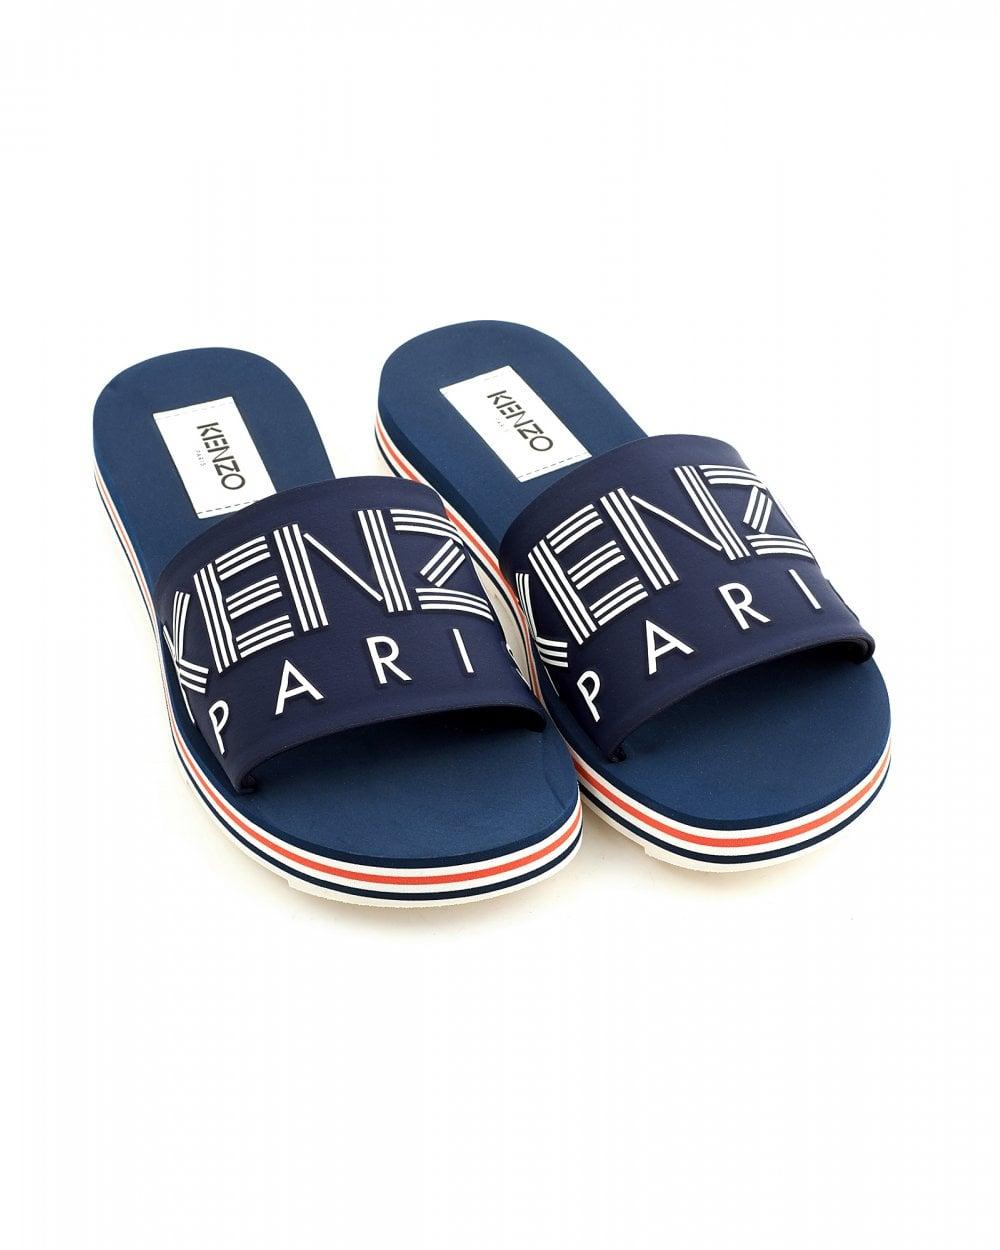 42fda0223 Kenzo Mens Papaya Sliders, Midnight Blue Slip On Sandals